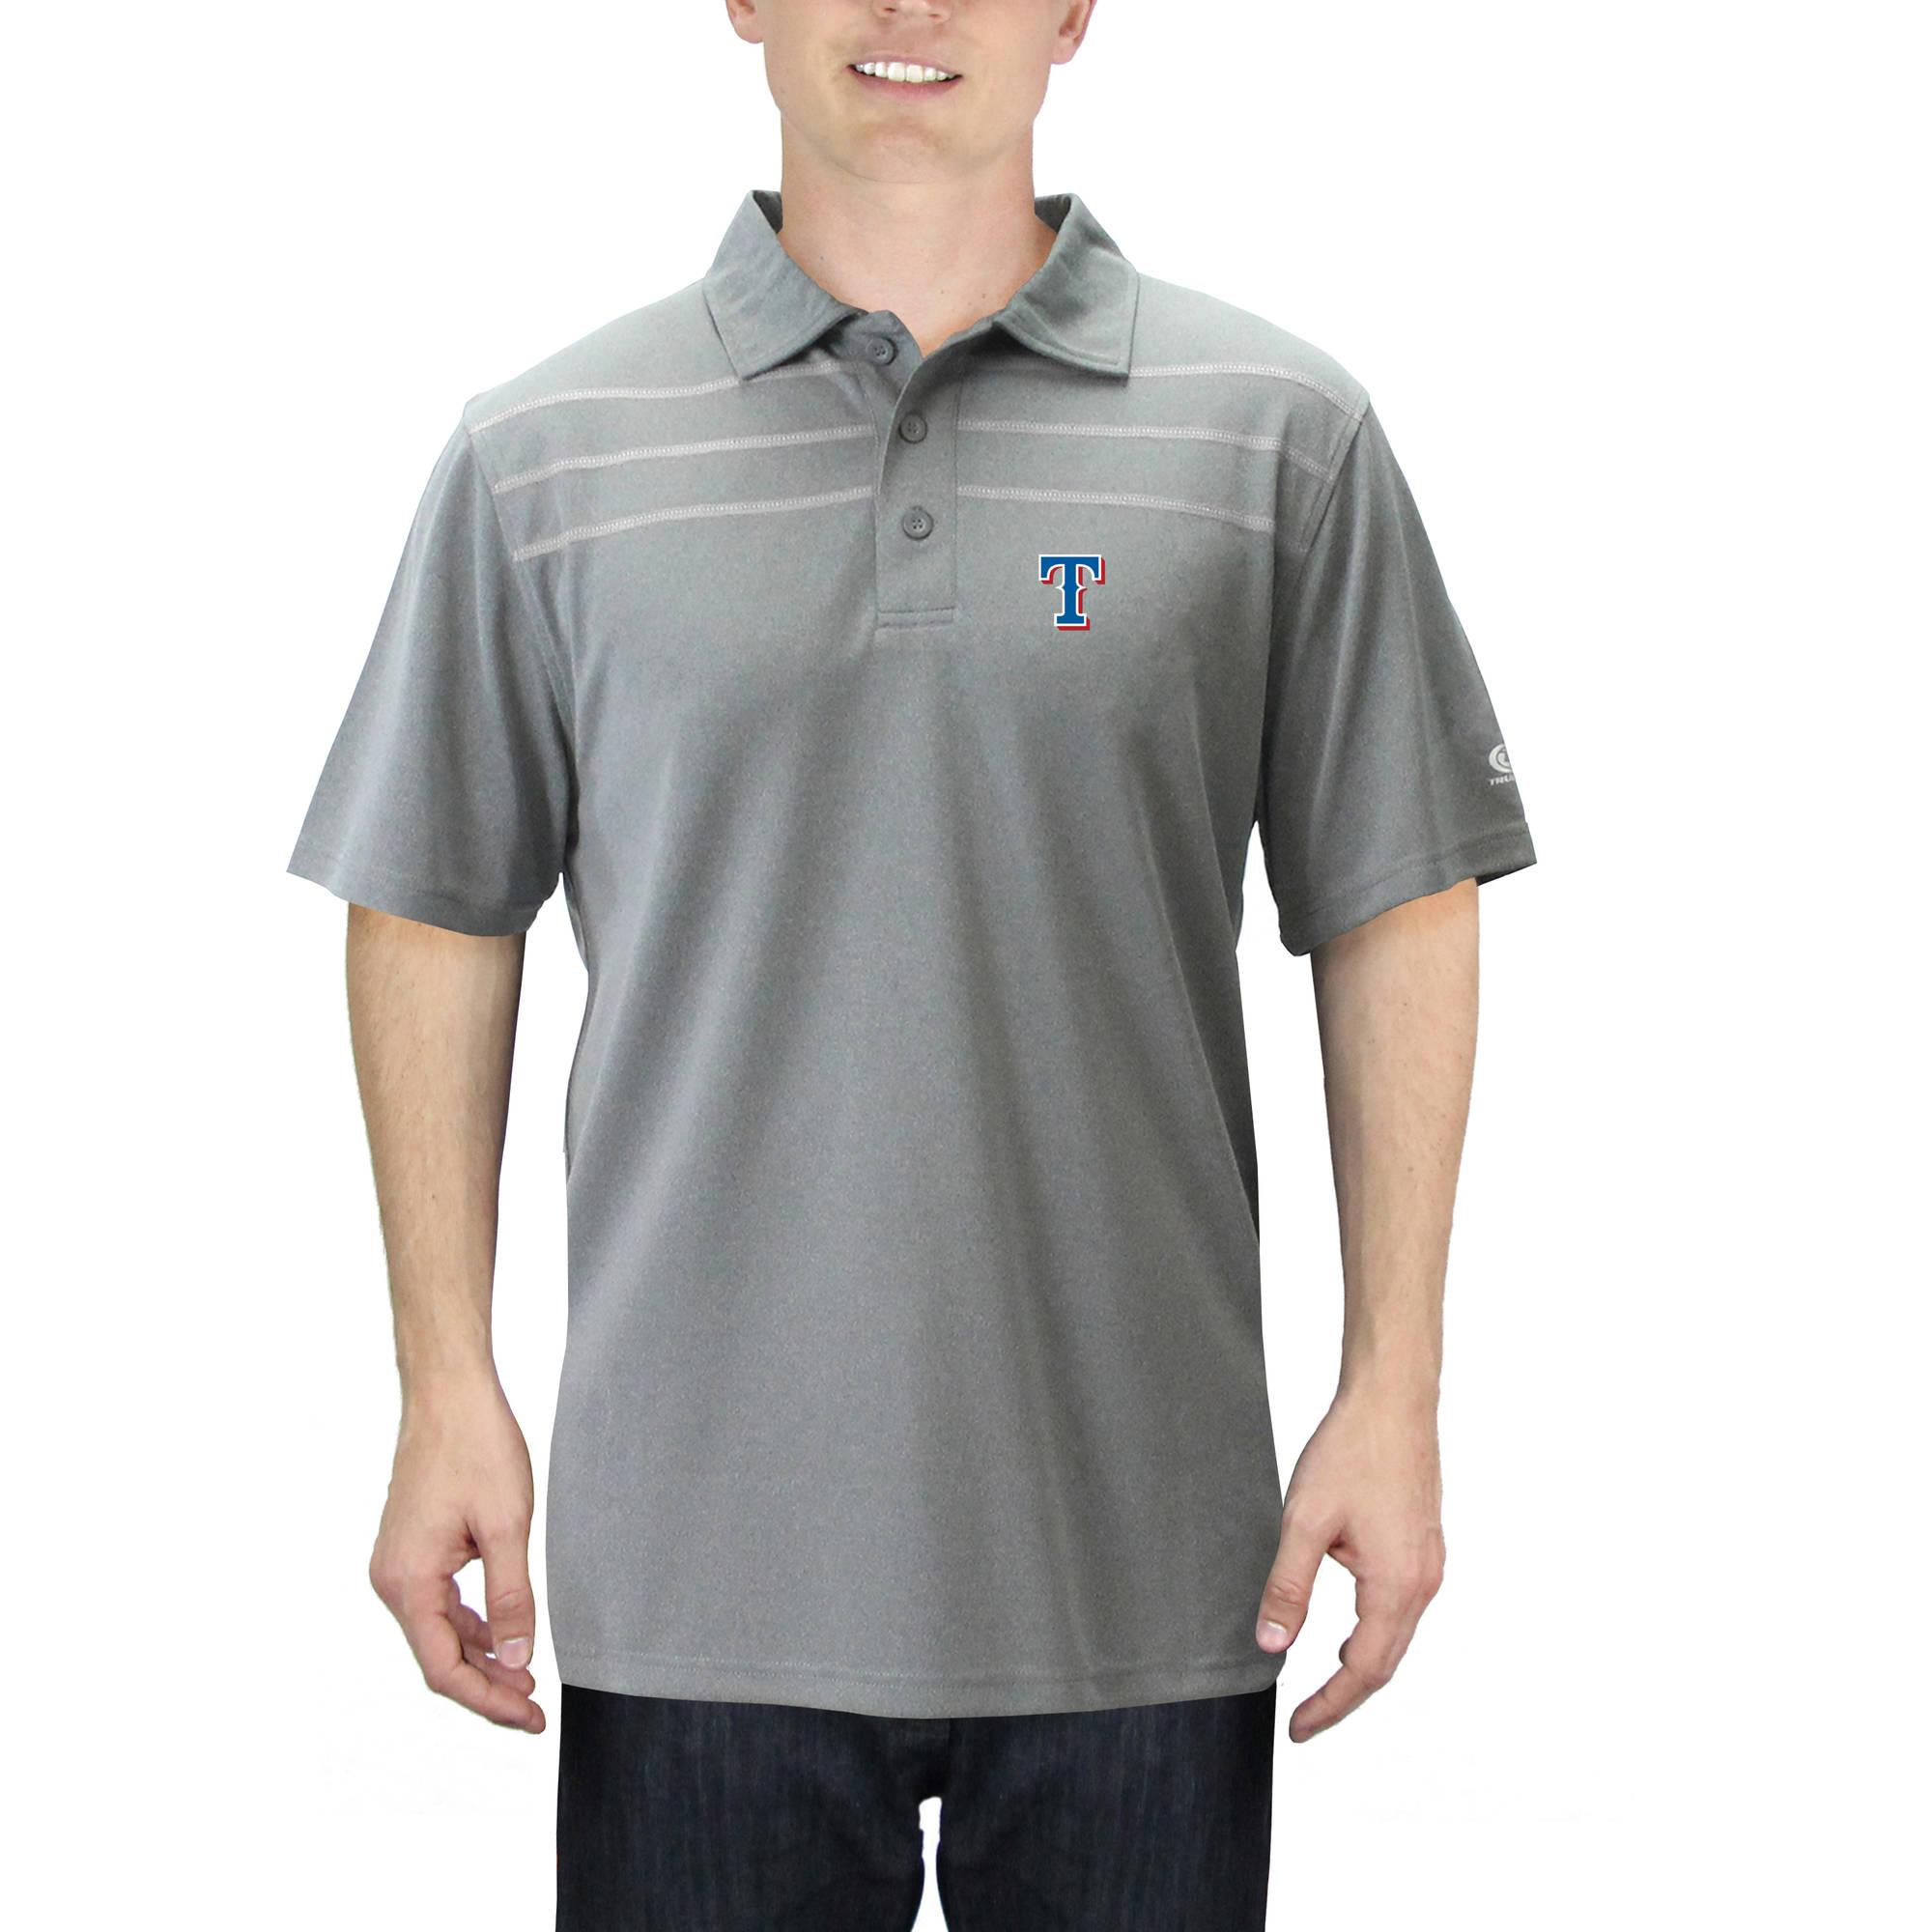 MLB Texas Rangers Big Men's Mini Pique Short Sleeve Polo, 2XL